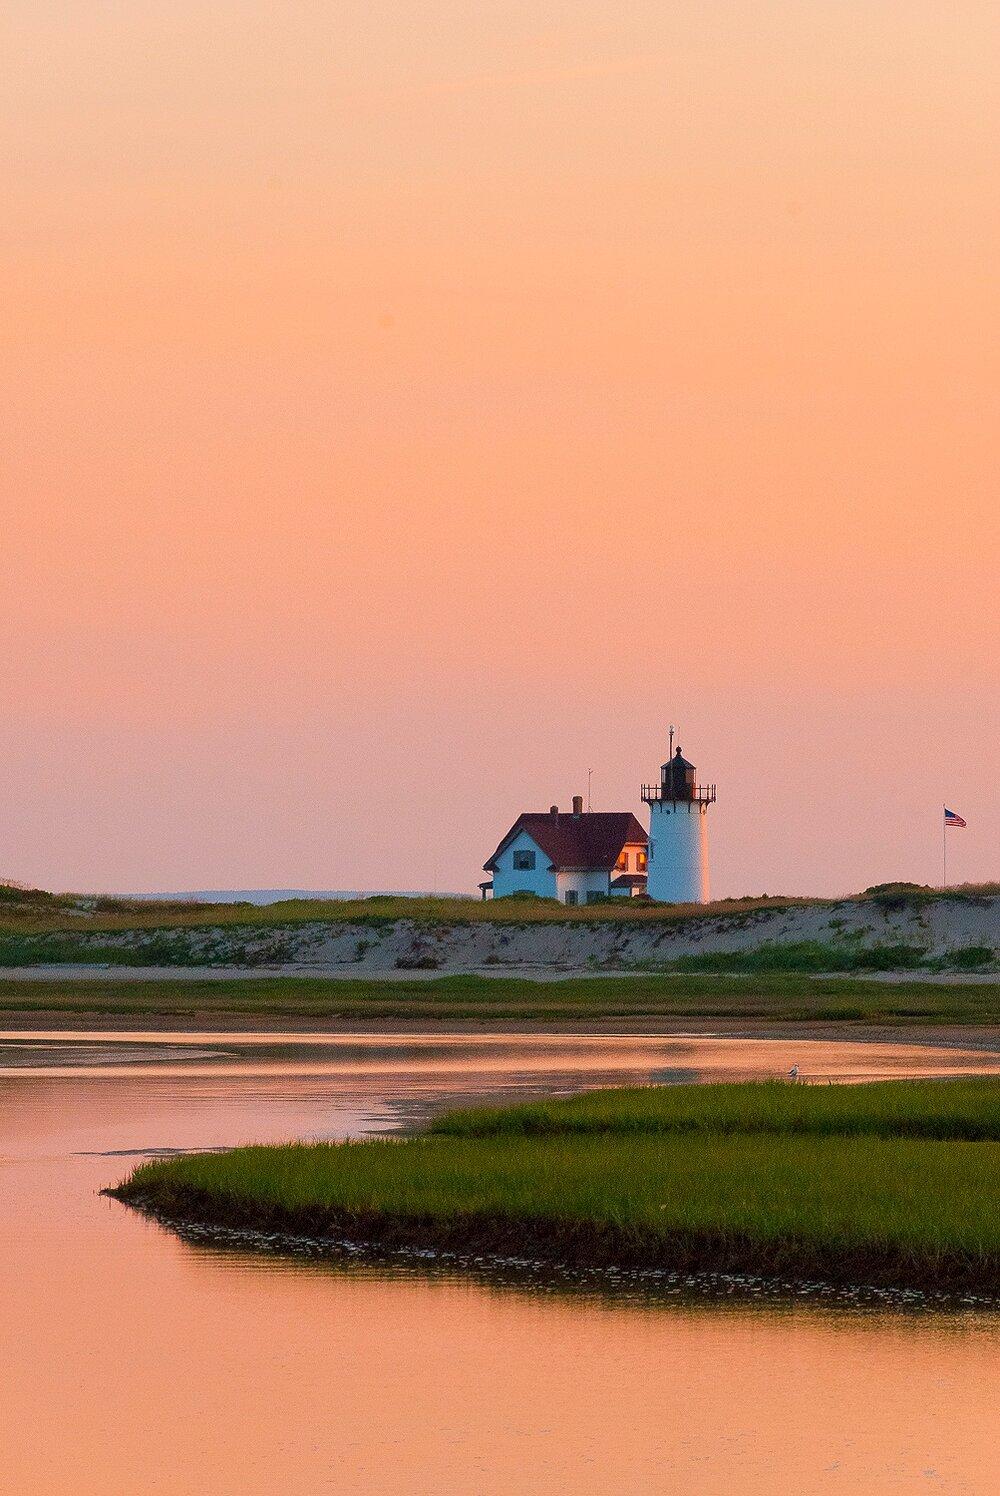 Sunset at Race Point Light II - Cape Cod National Seashore, Massachusetts